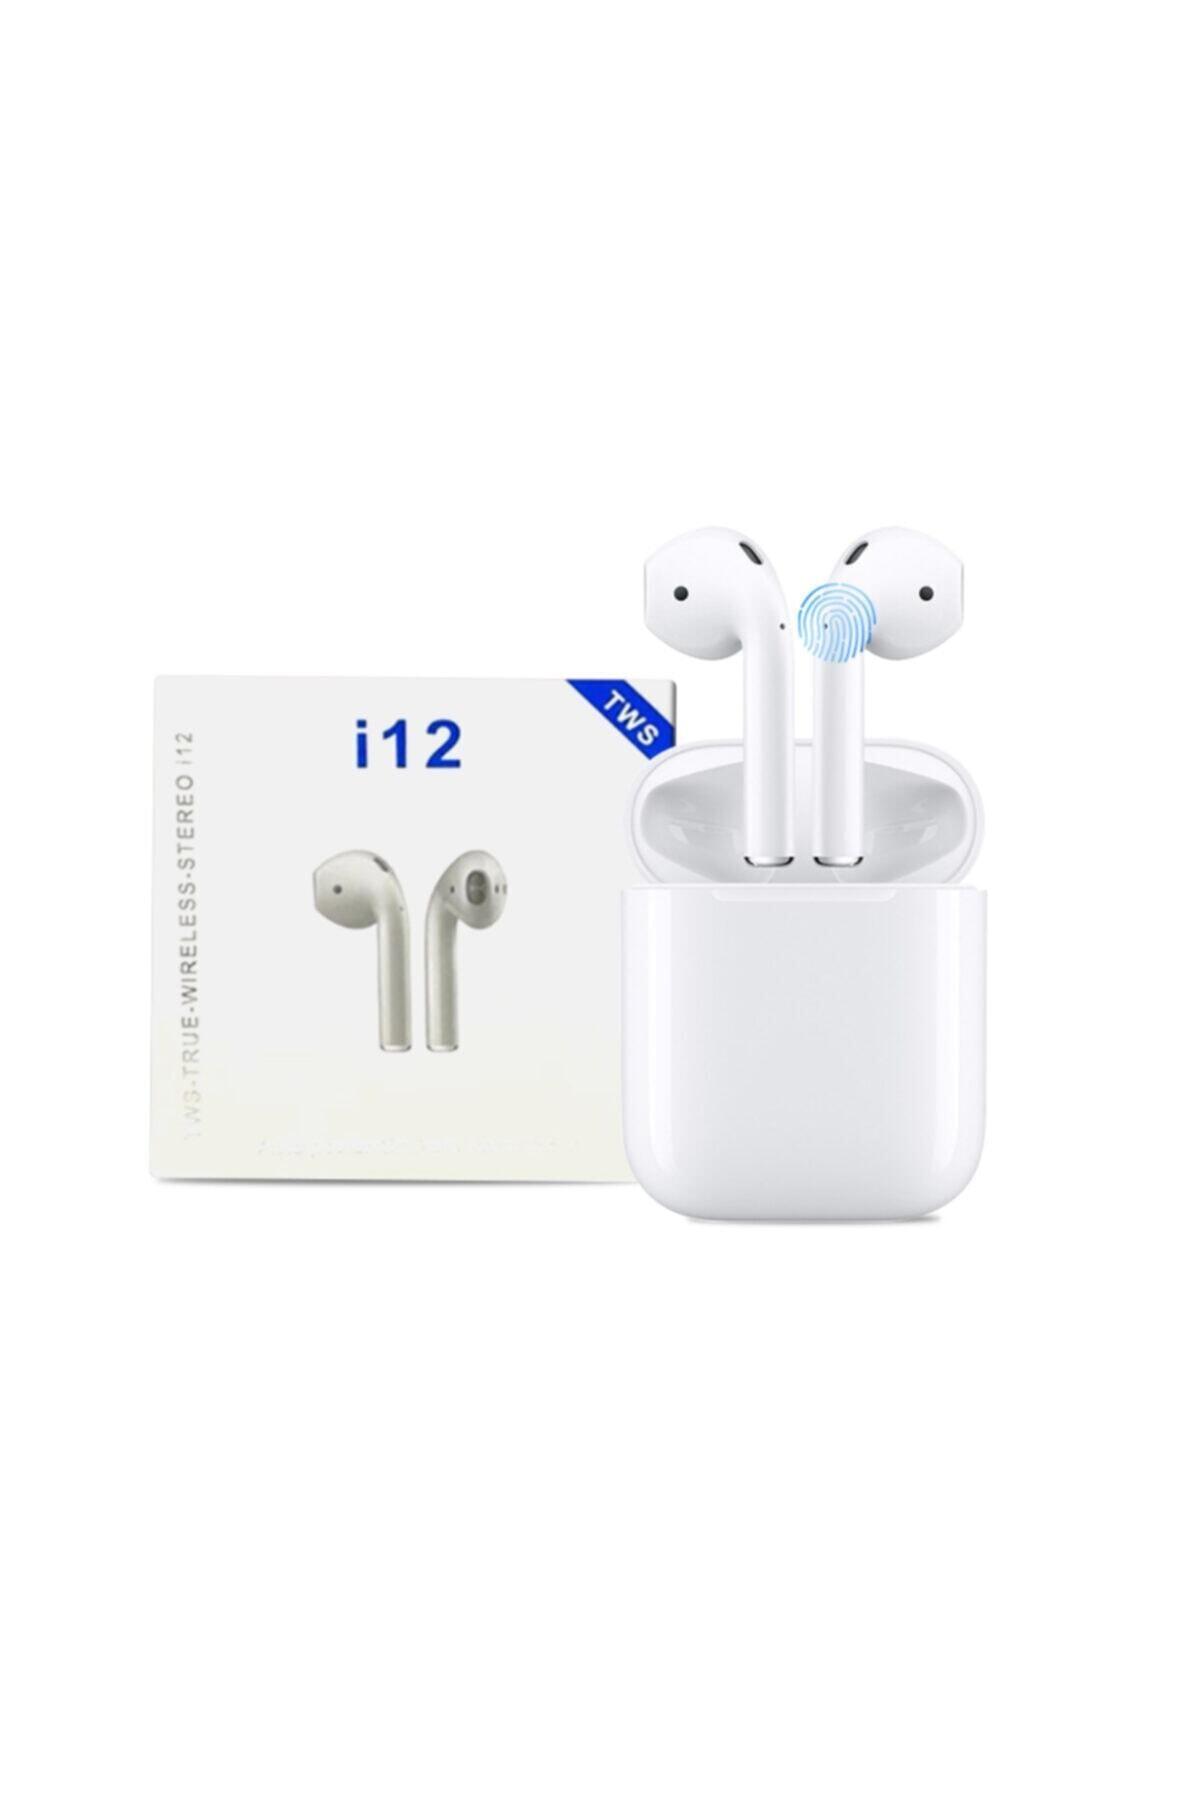 Tws Airpods I12 Bluetooth V5.0 Kablosuz Kulaklık I12 Iphone Bluetooth Kulaklık Hd Ses Kalitesi 1